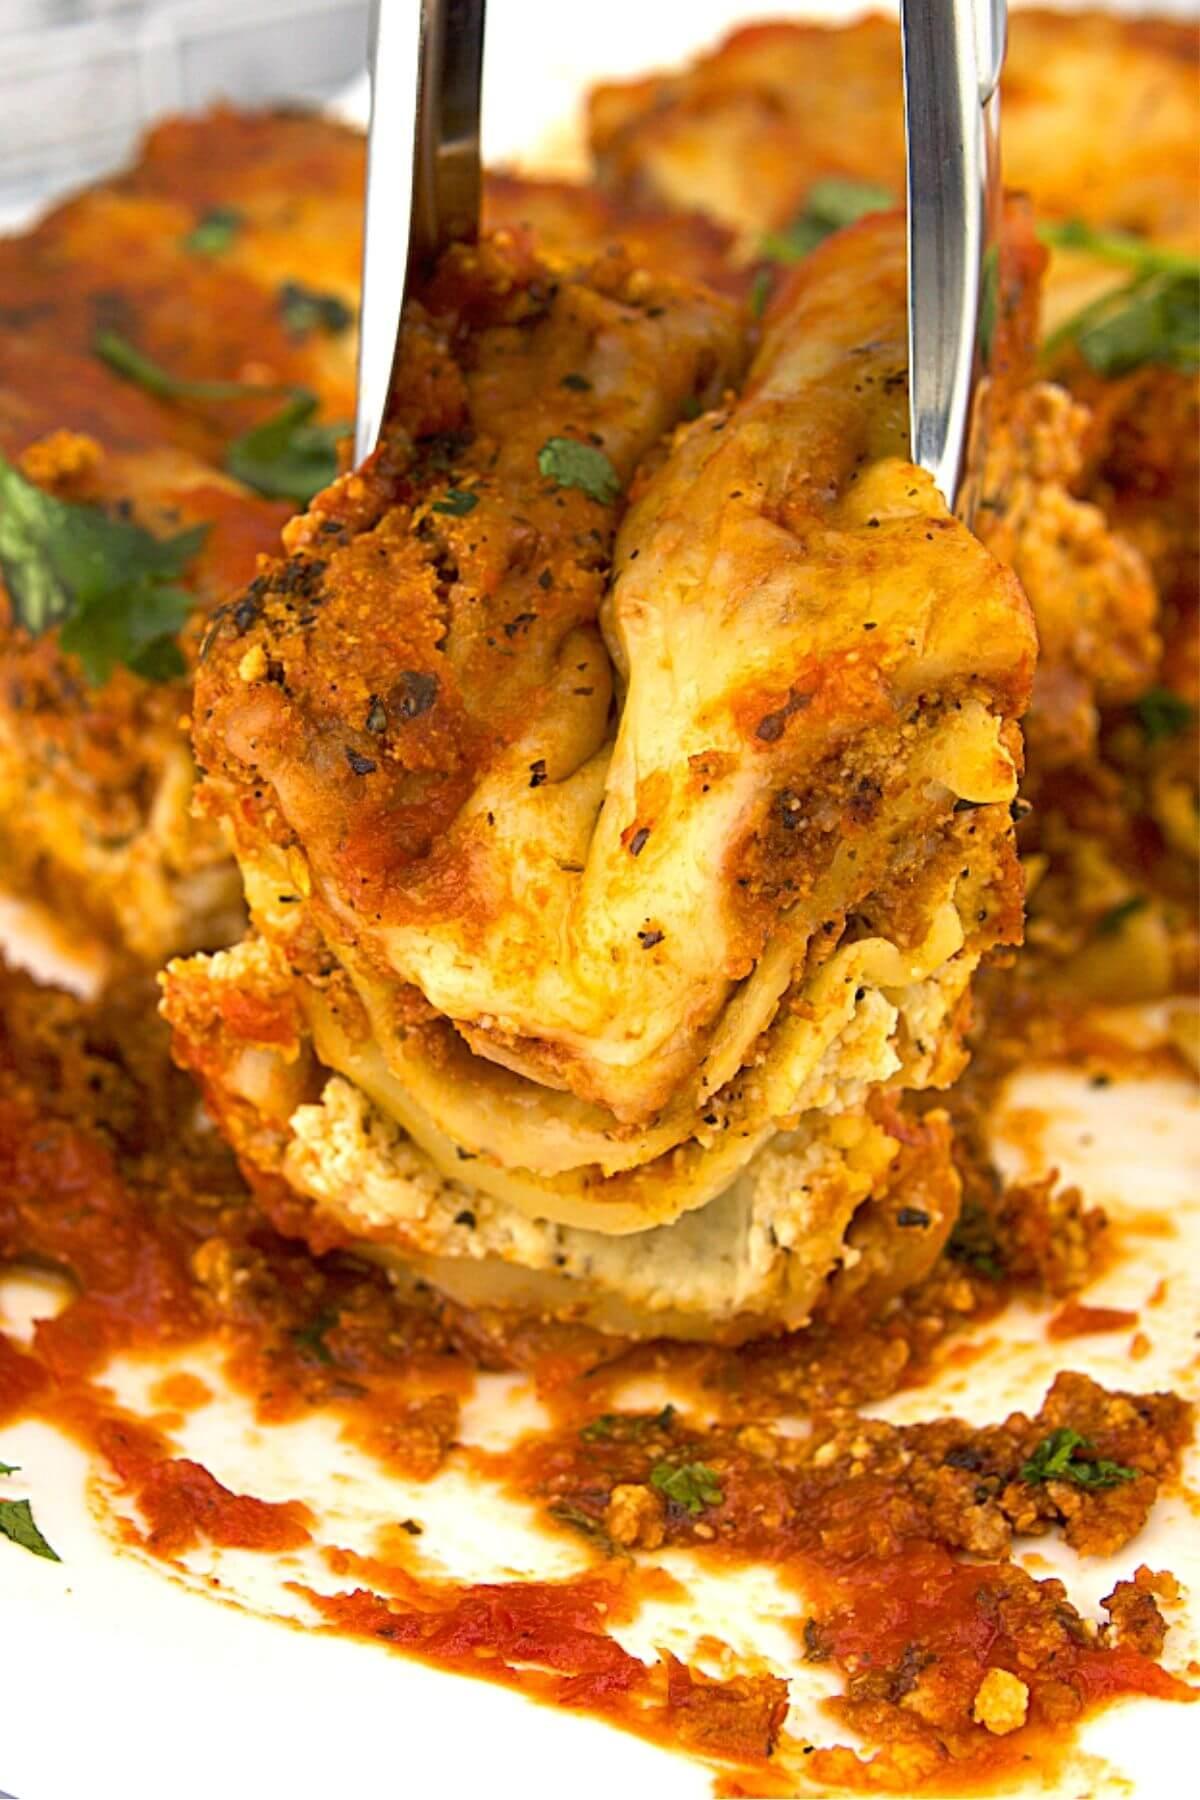 Easy Homemade Oven Ready Lasagna 4 of 5